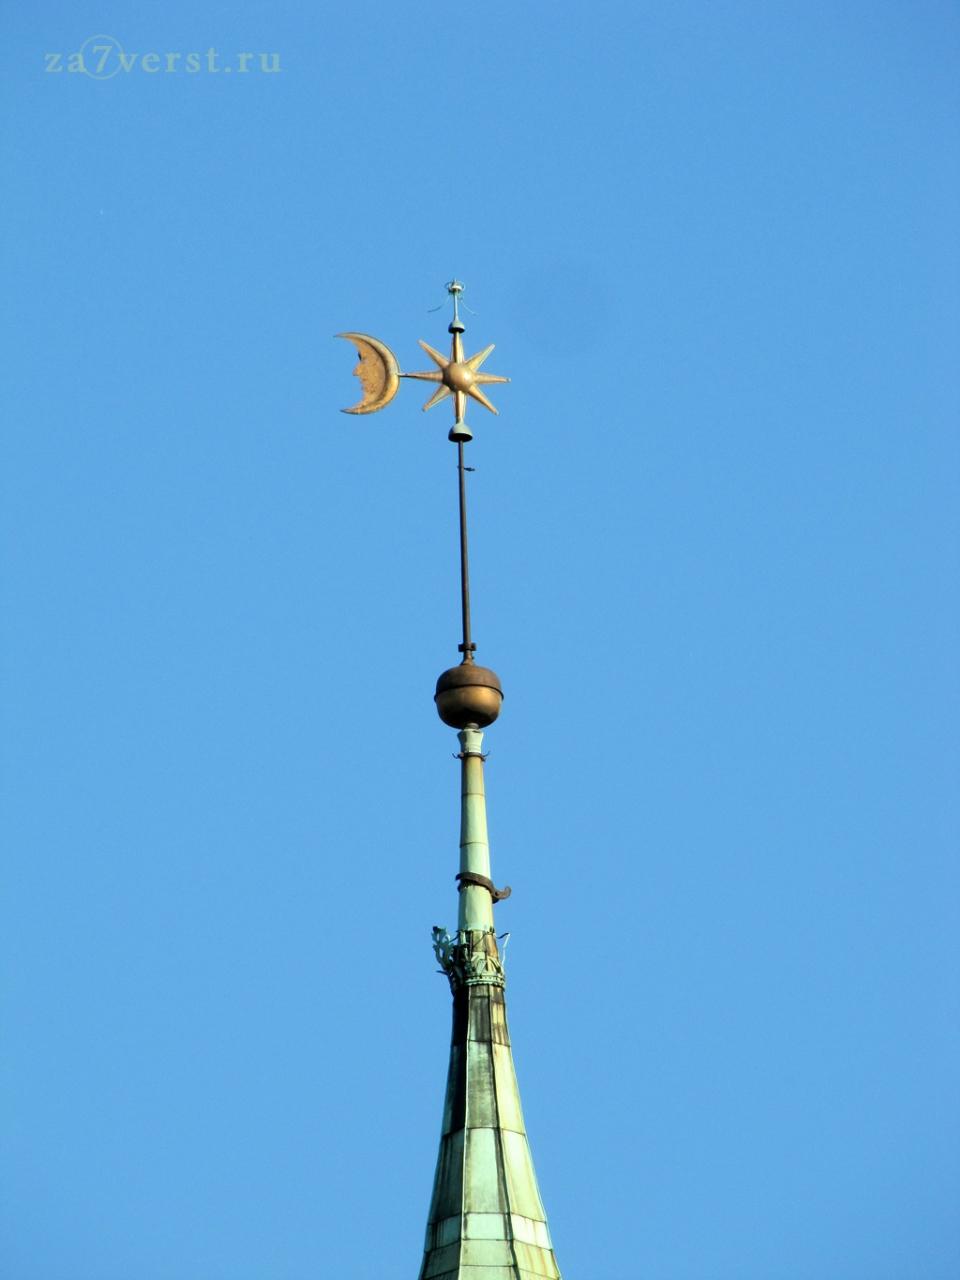 Собор святого Мартина, Кольмар, Эльзас, Франция